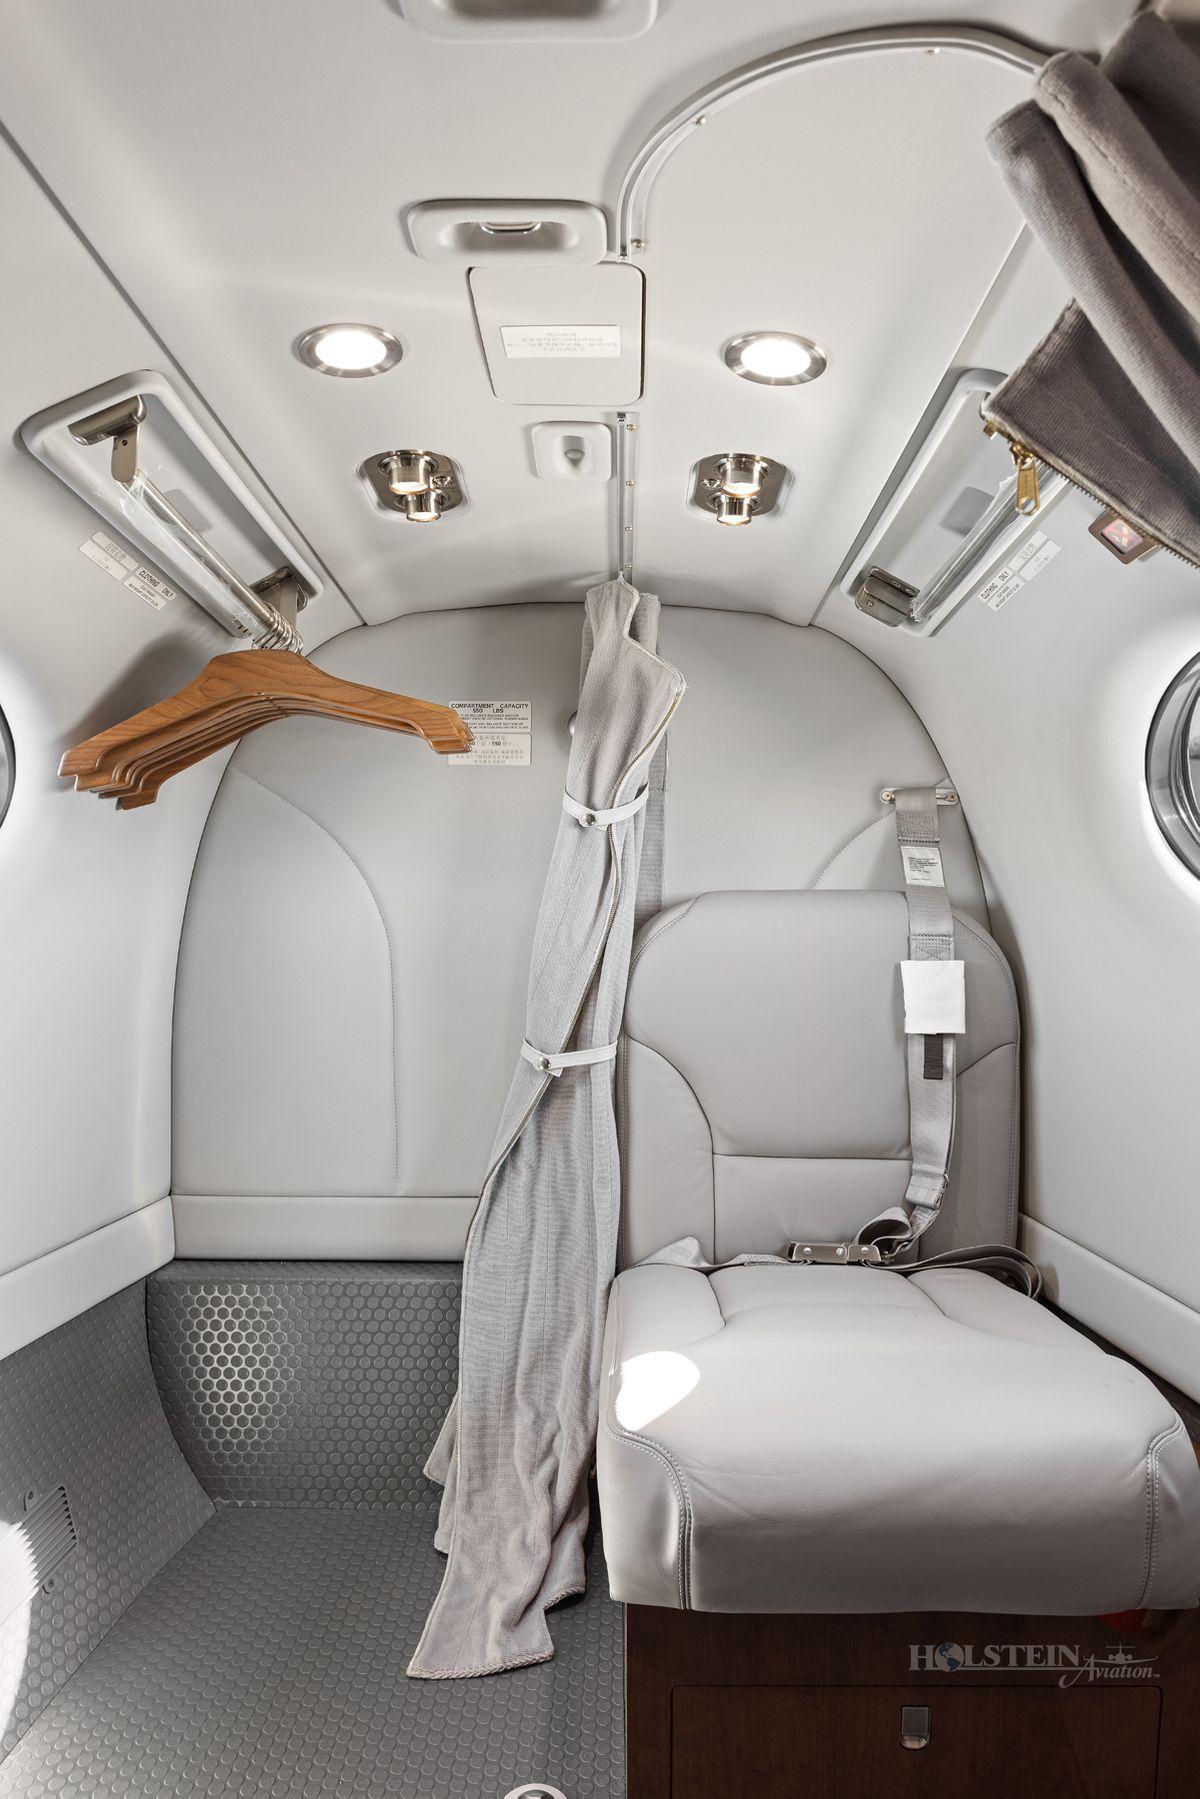 2018 King Air 350iER - FL-1157 - N1157F - Int - Belted Lav RGB.jpg